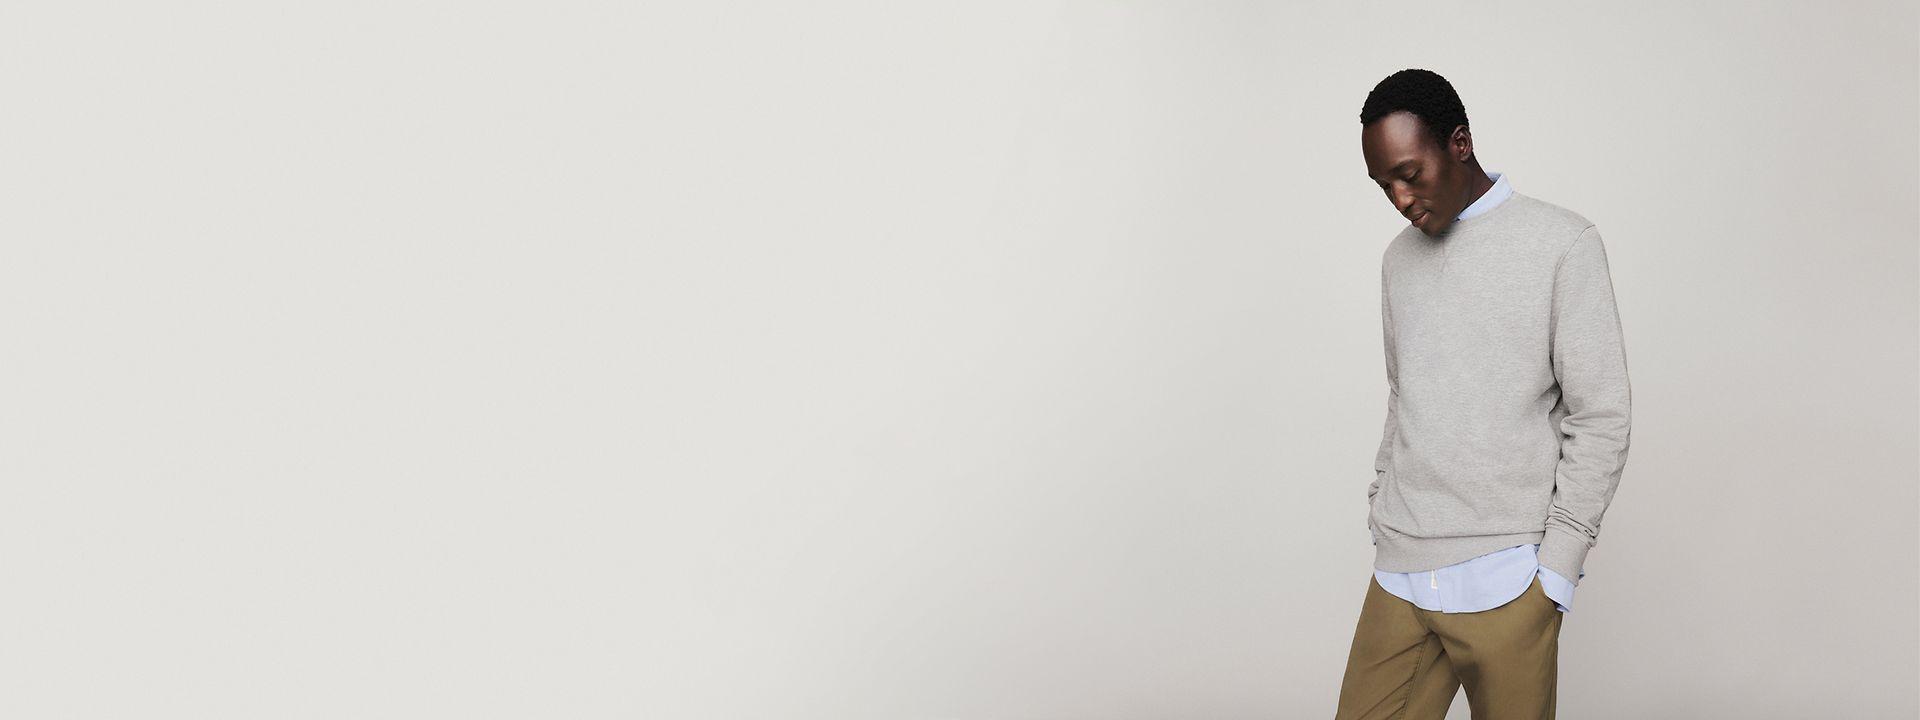 112021--gender---startpage--main-banner--topic---IMG